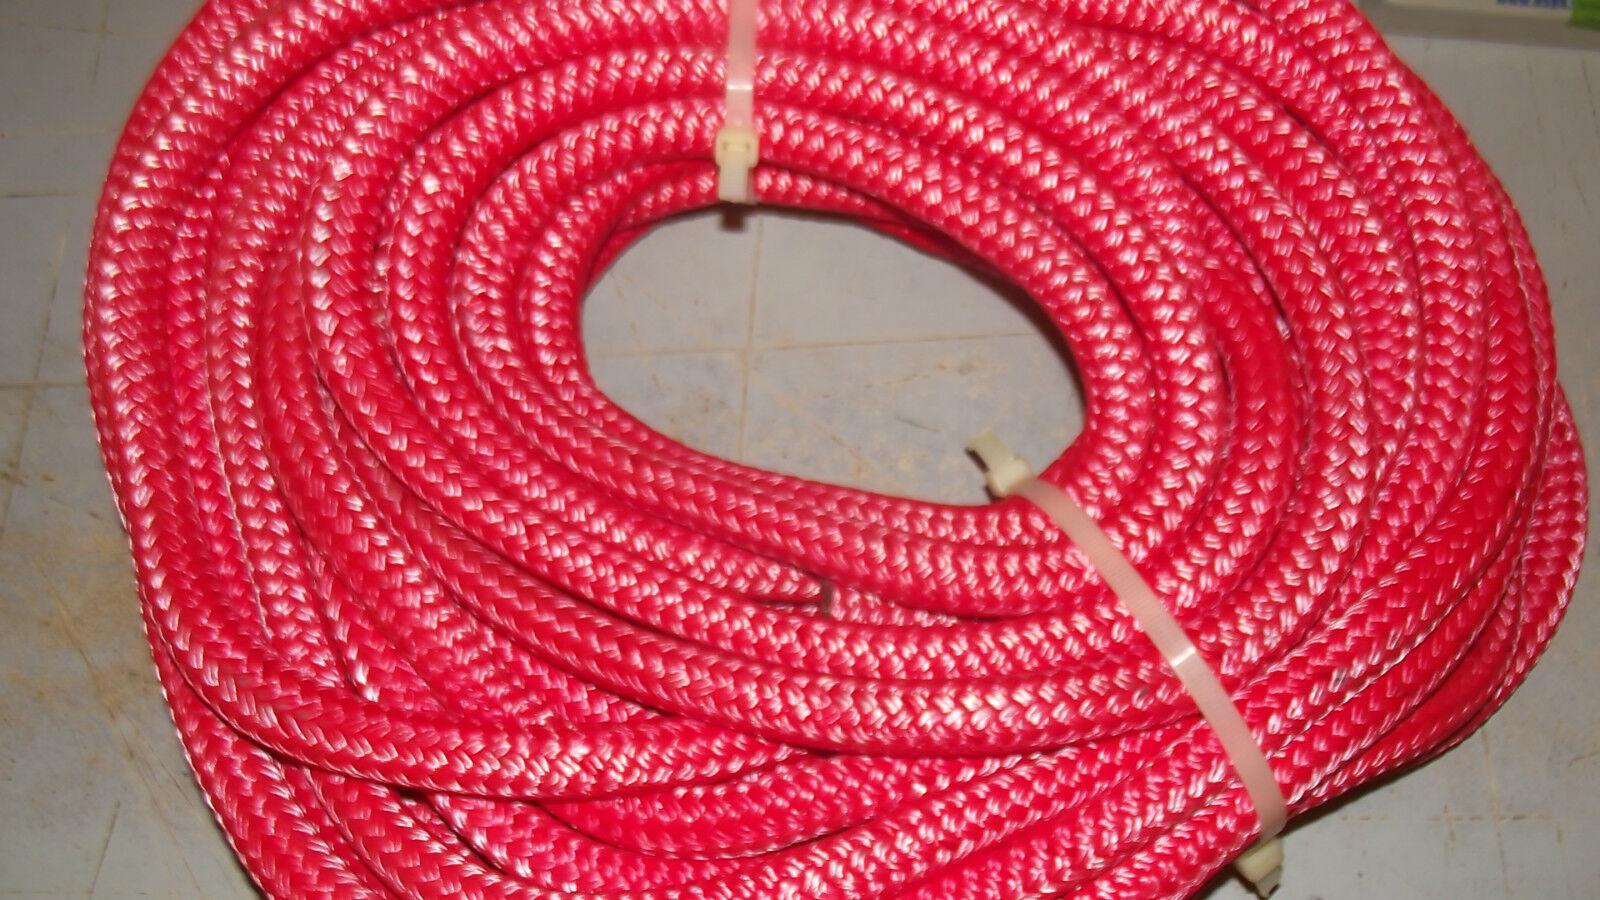 3 4  x 50' Double  Braid Rope, Arborist Bull Rope, Rigging Line, Hoist Line, NEW  shop online